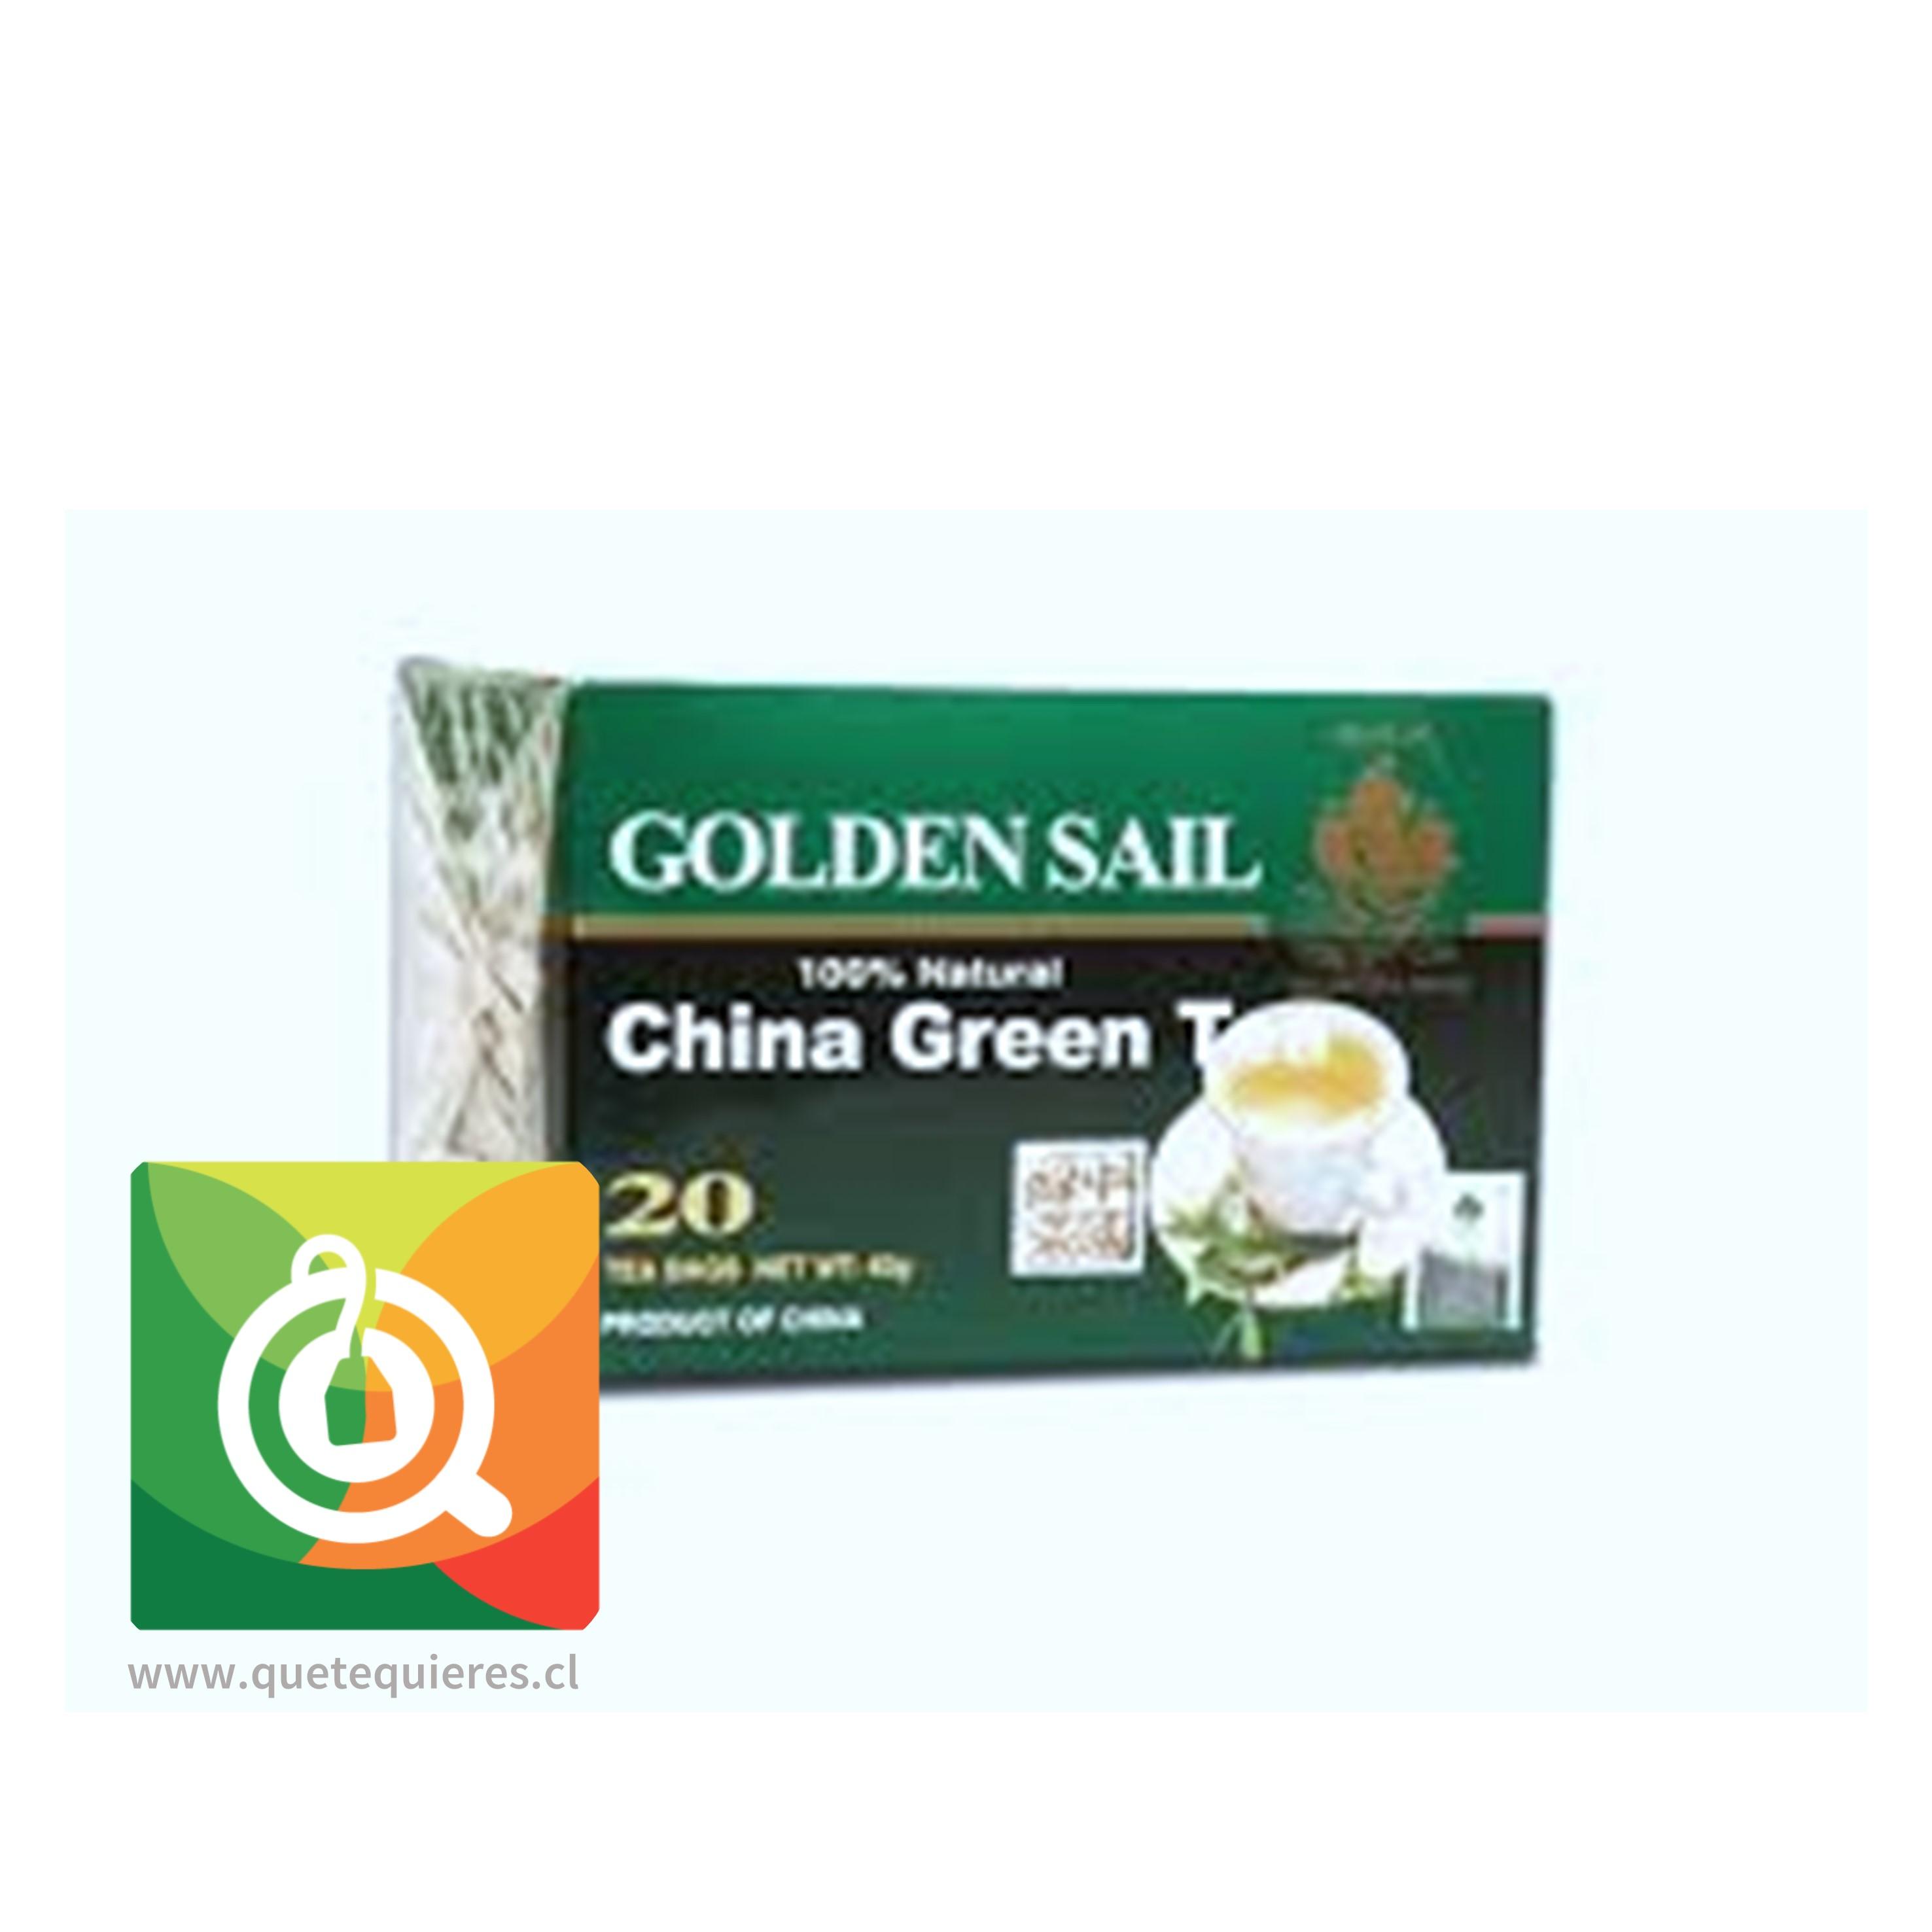 Golden Sail Té Verde